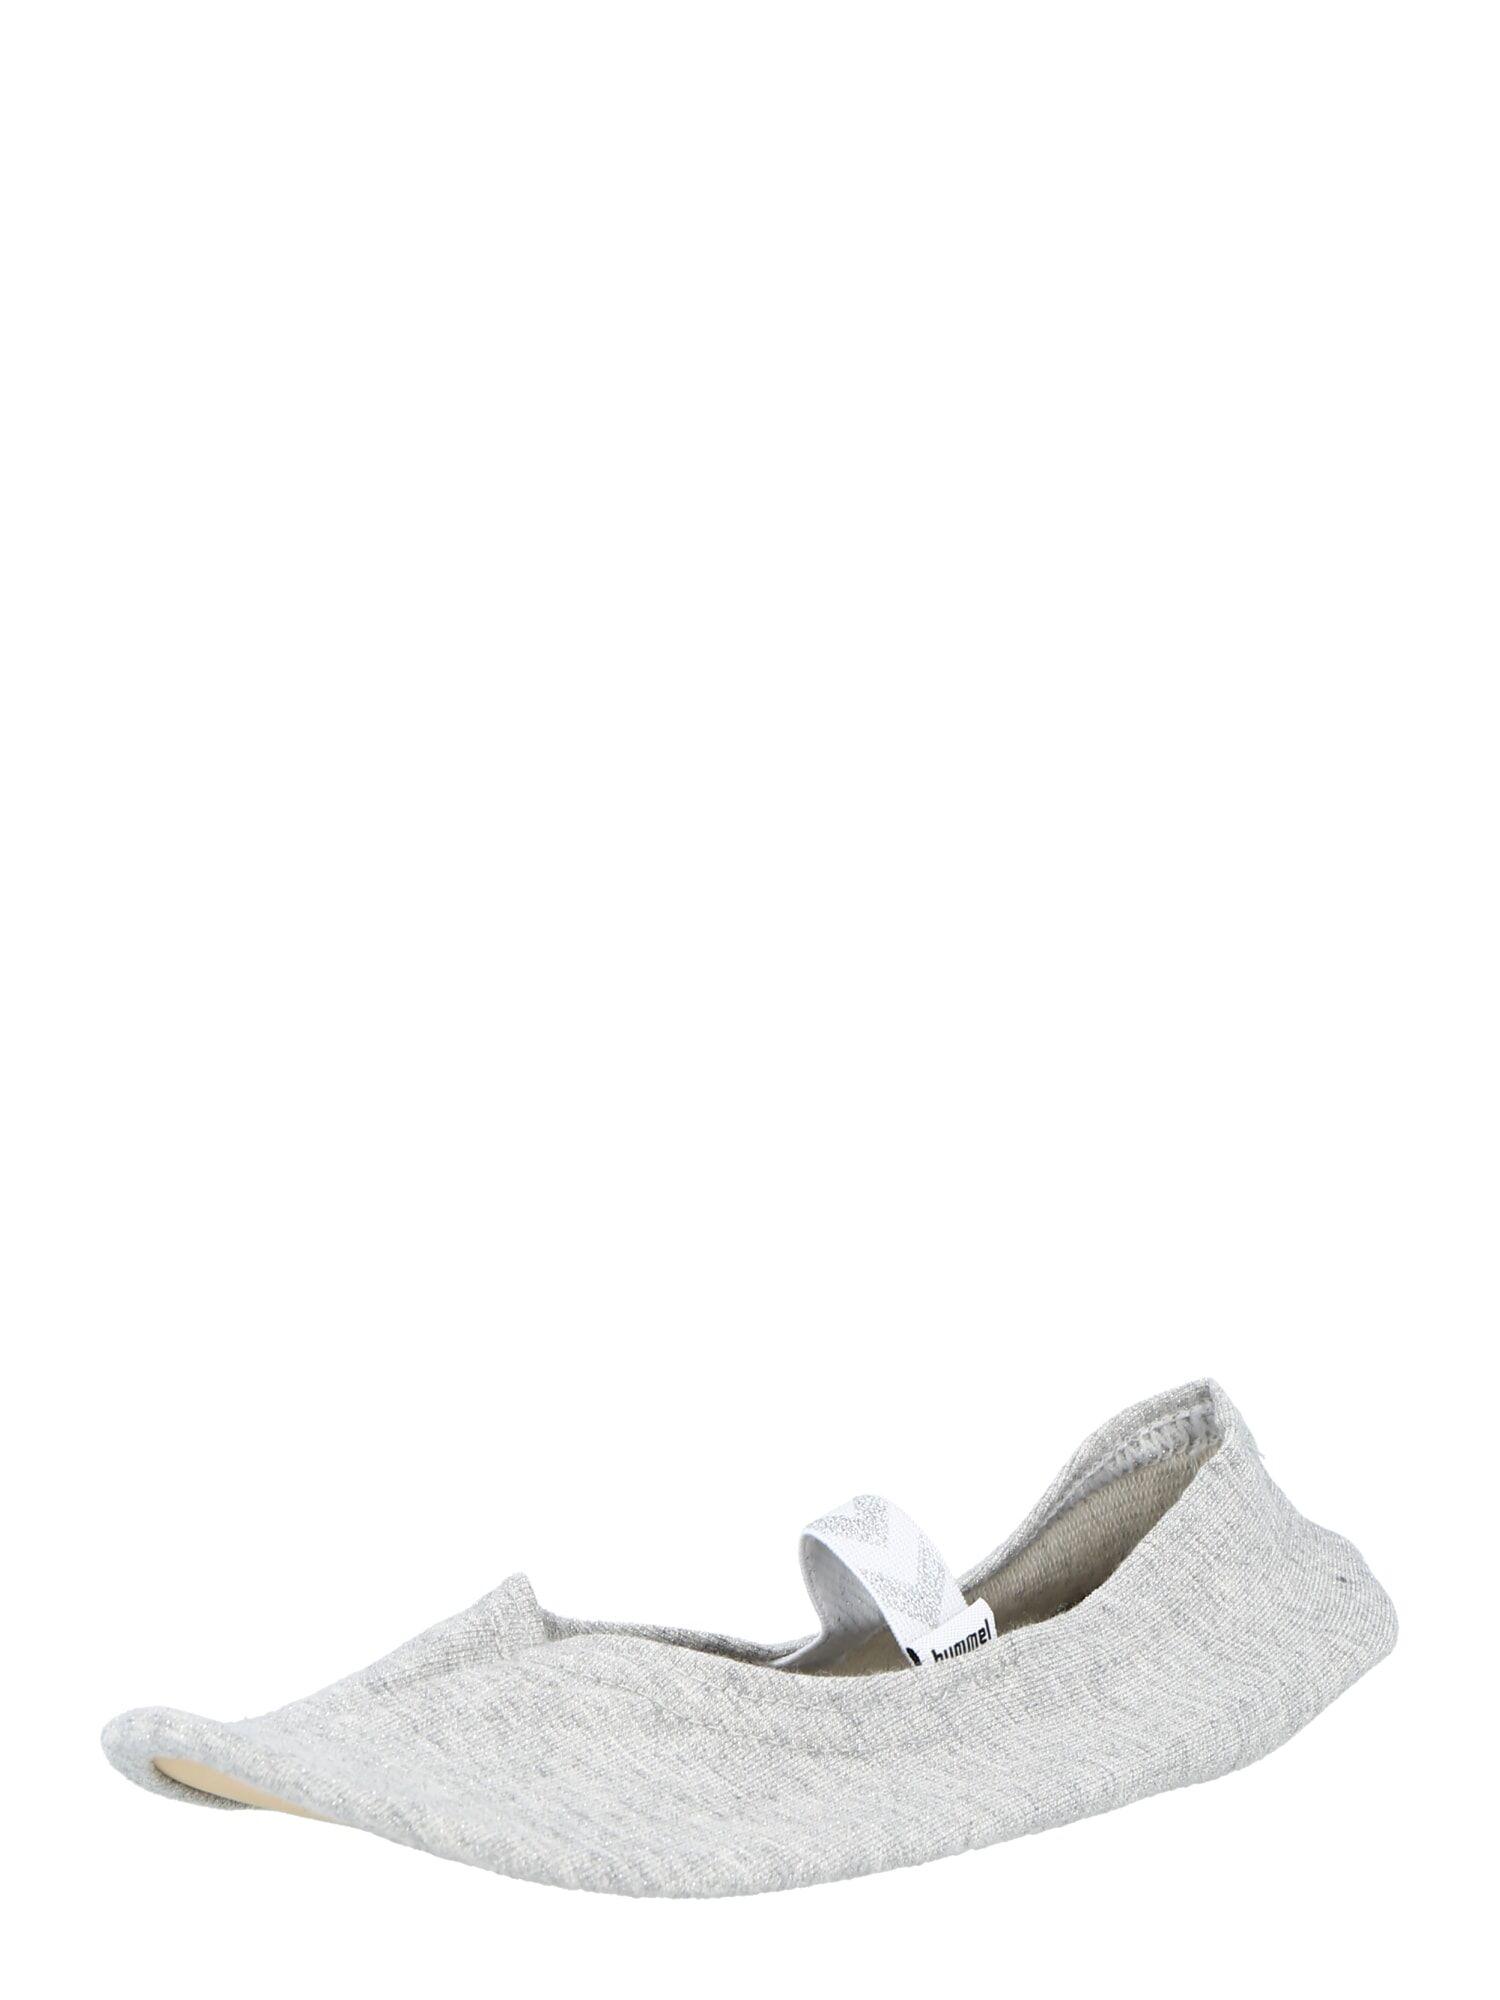 Hummel Chaussure de sport  - Gris - Taille: 31 - boy